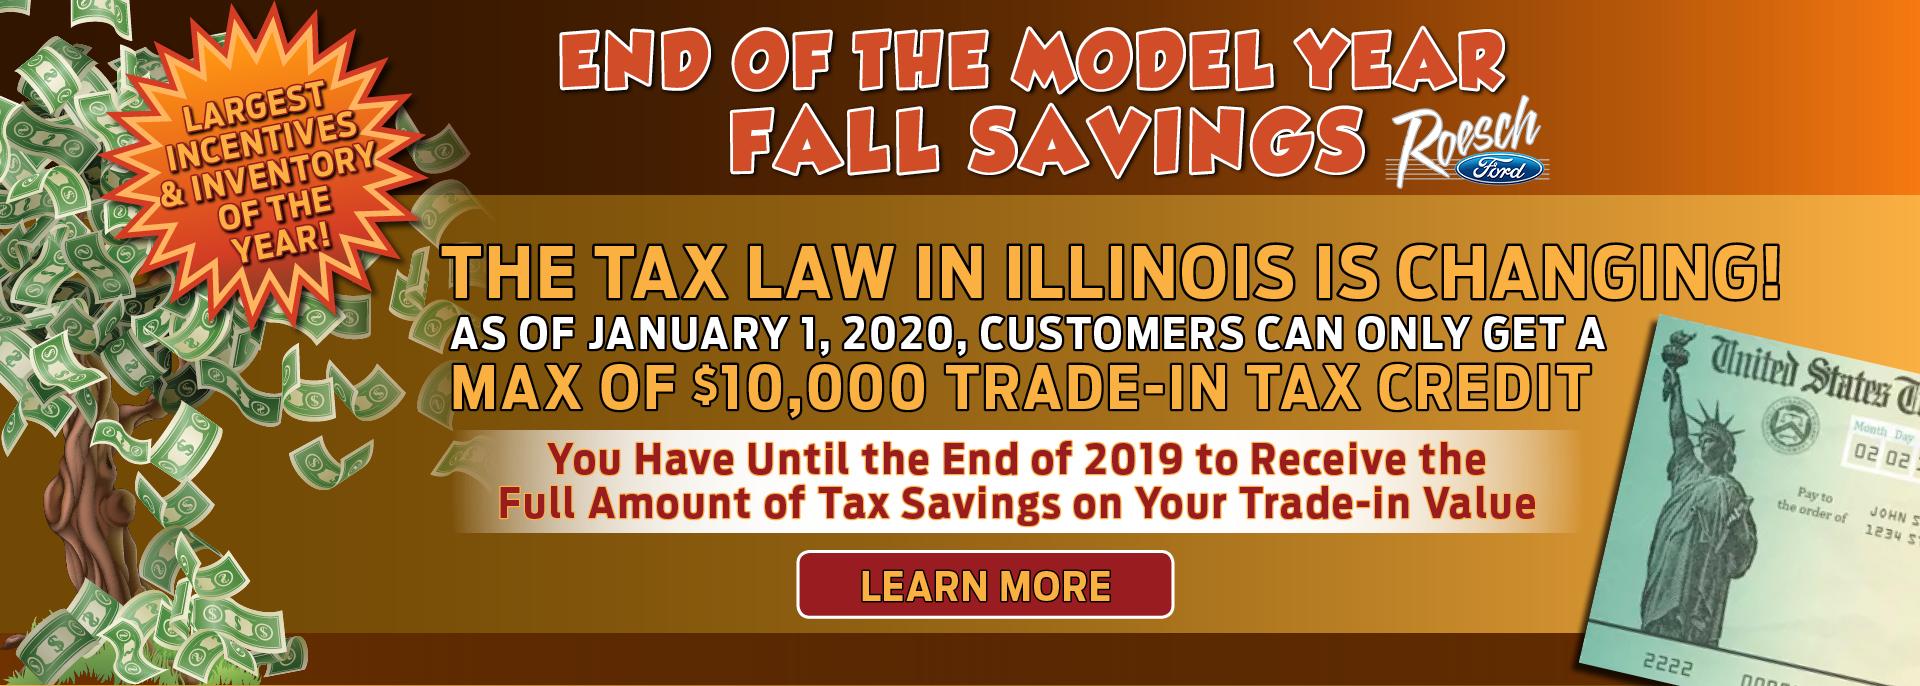 Roe Ford Tax Law 10000 Oct 1920x686